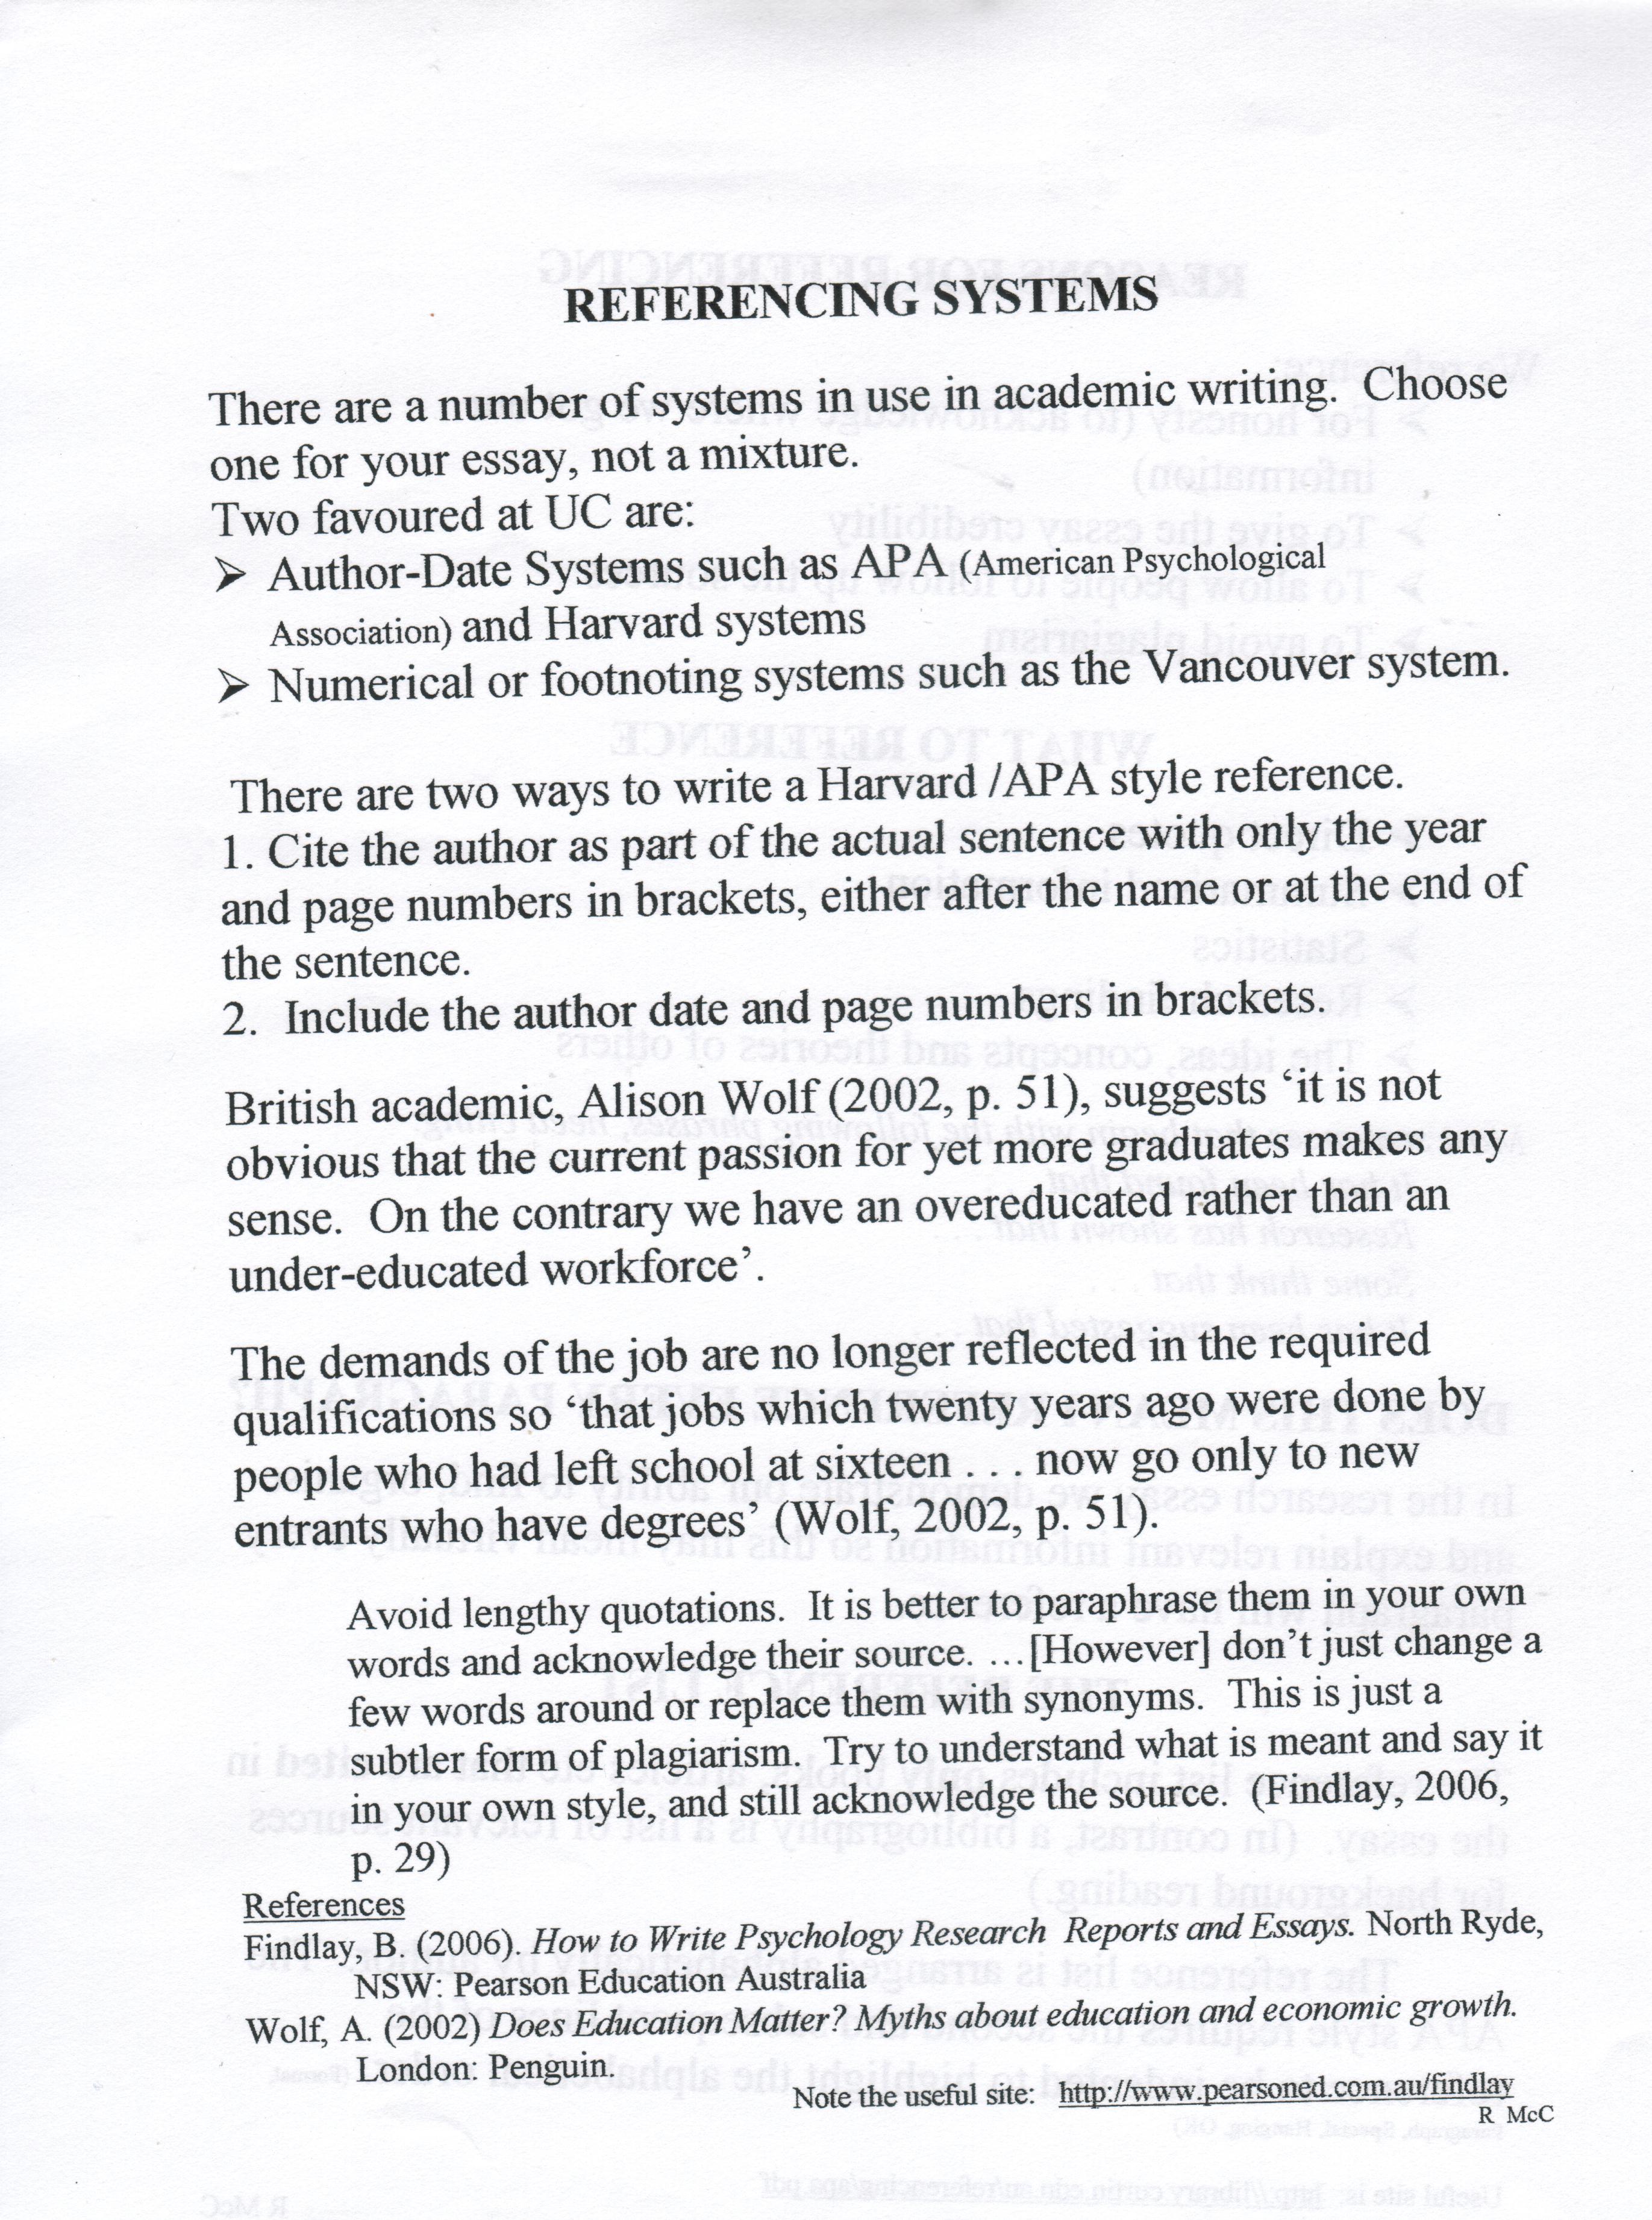 Top descriptive essay ghostwriter site for university